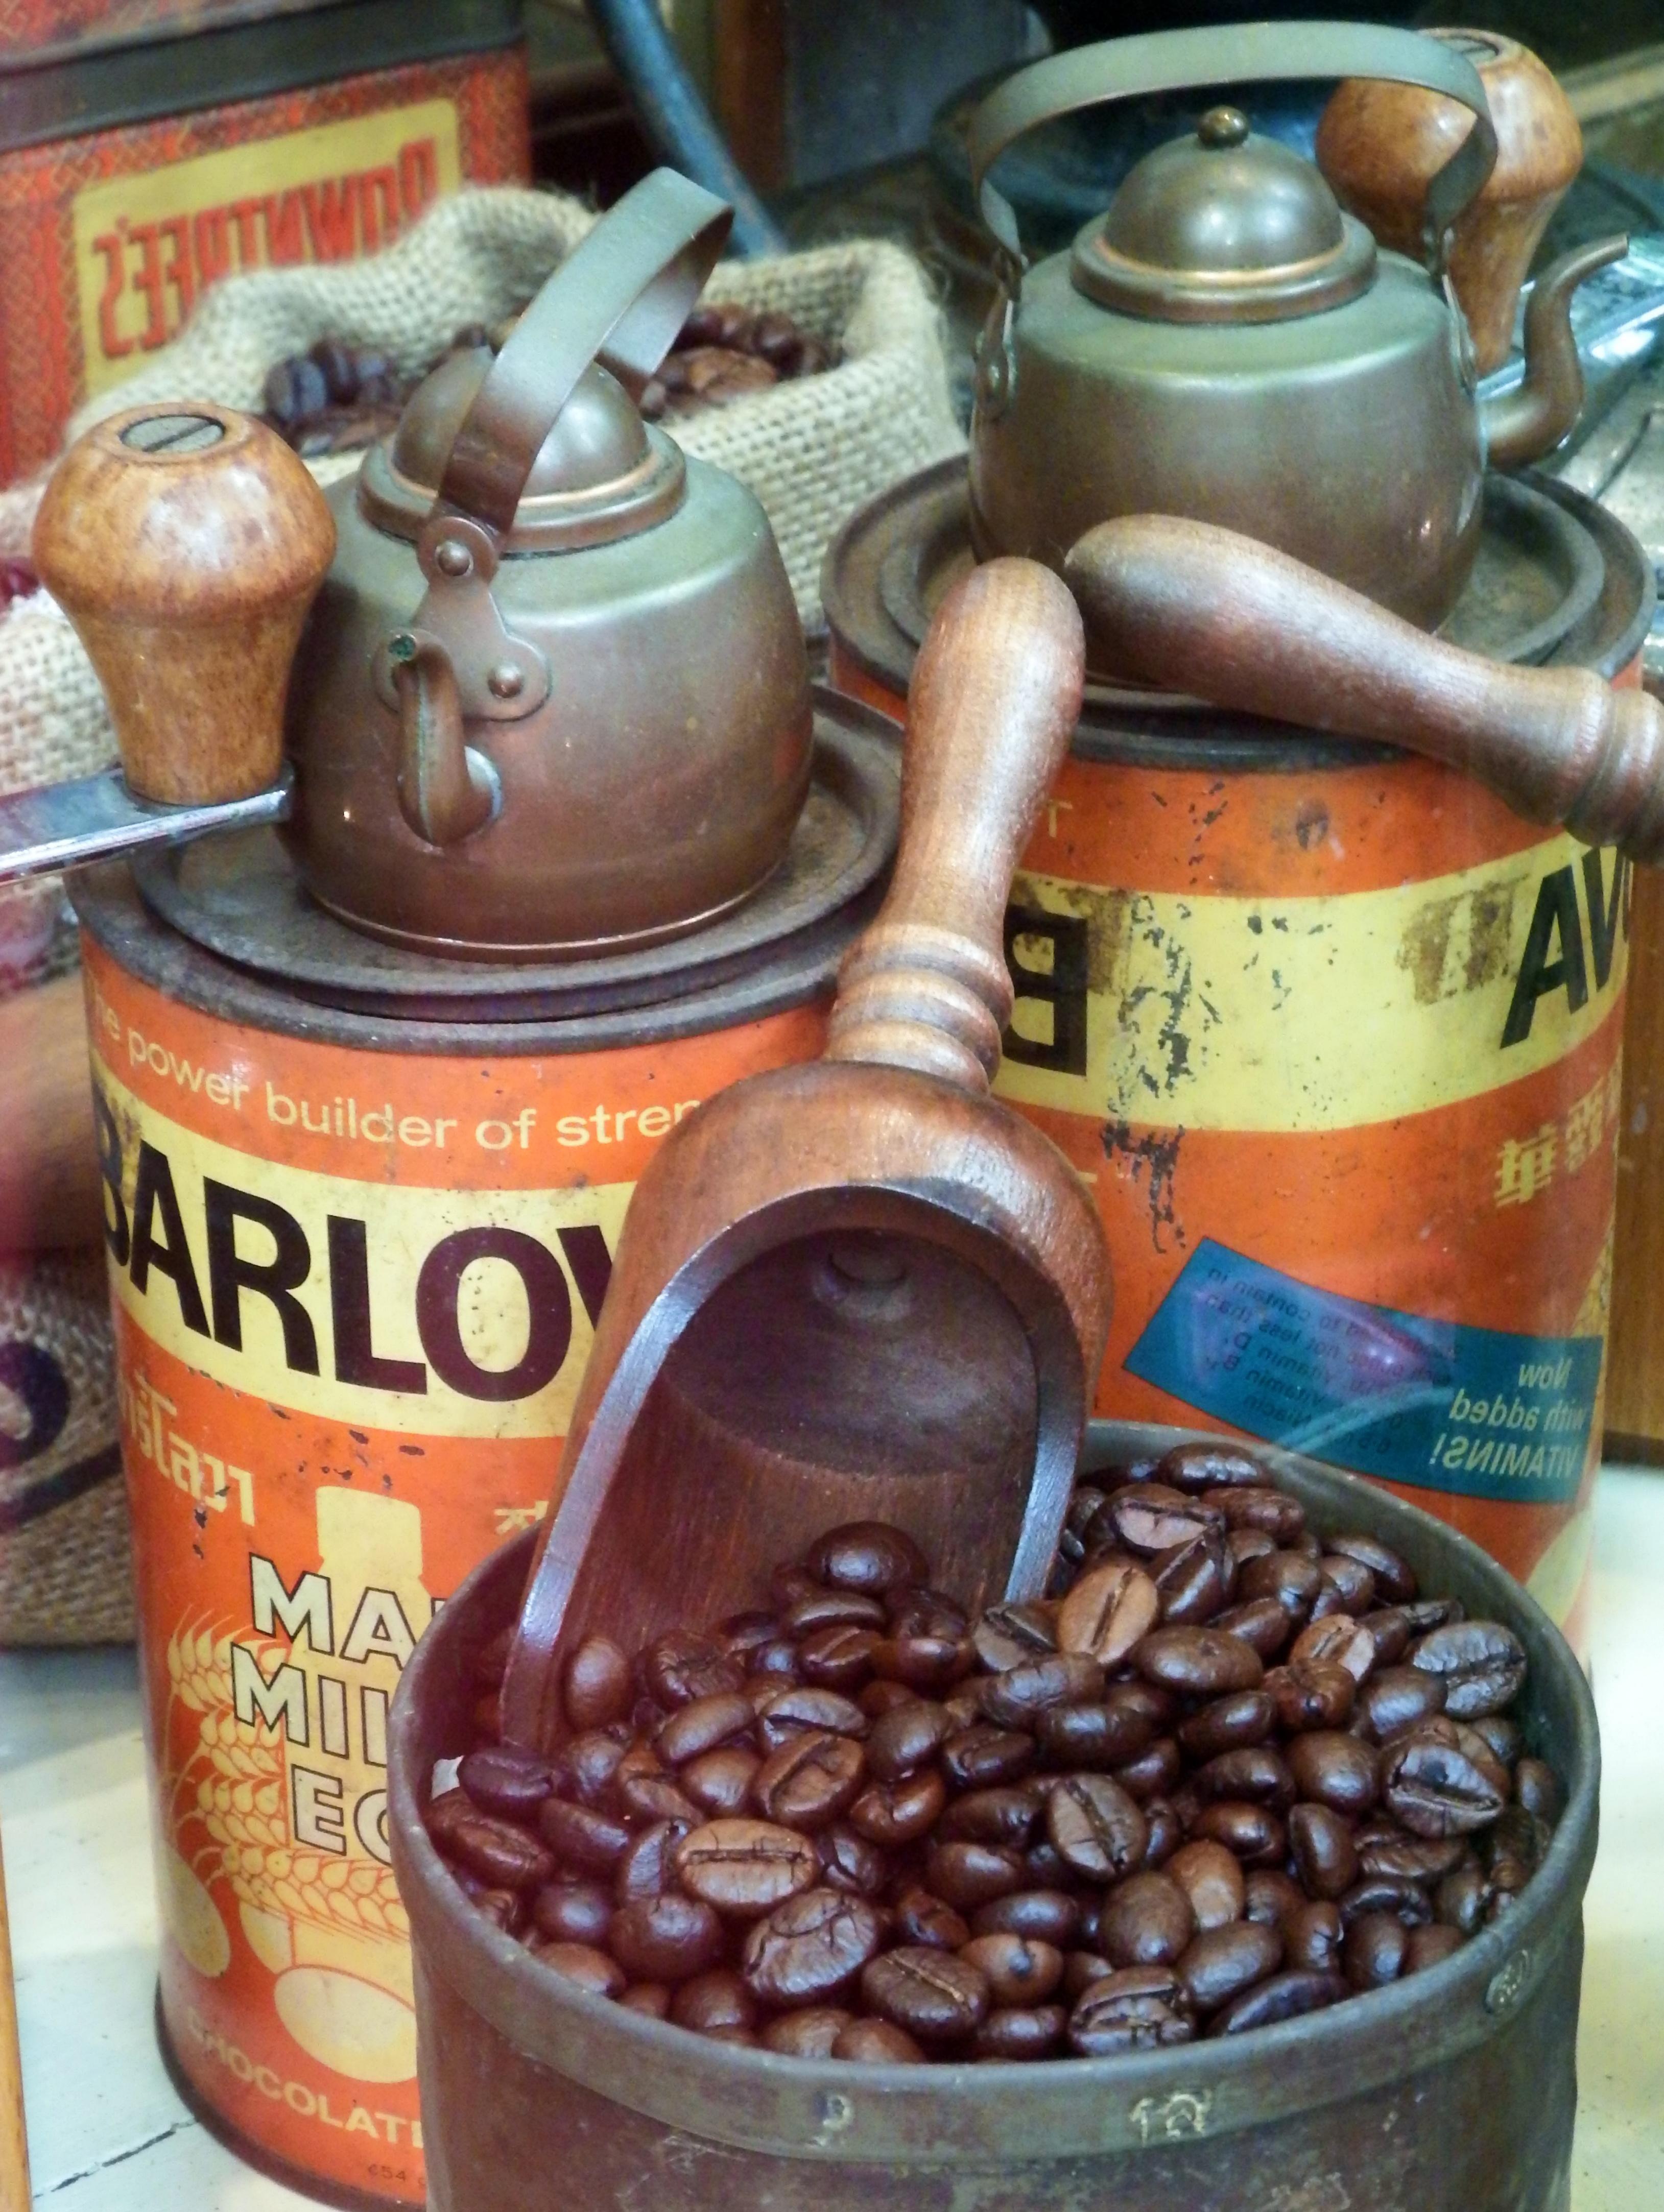 Coffee beans with vintage memorabilia photo